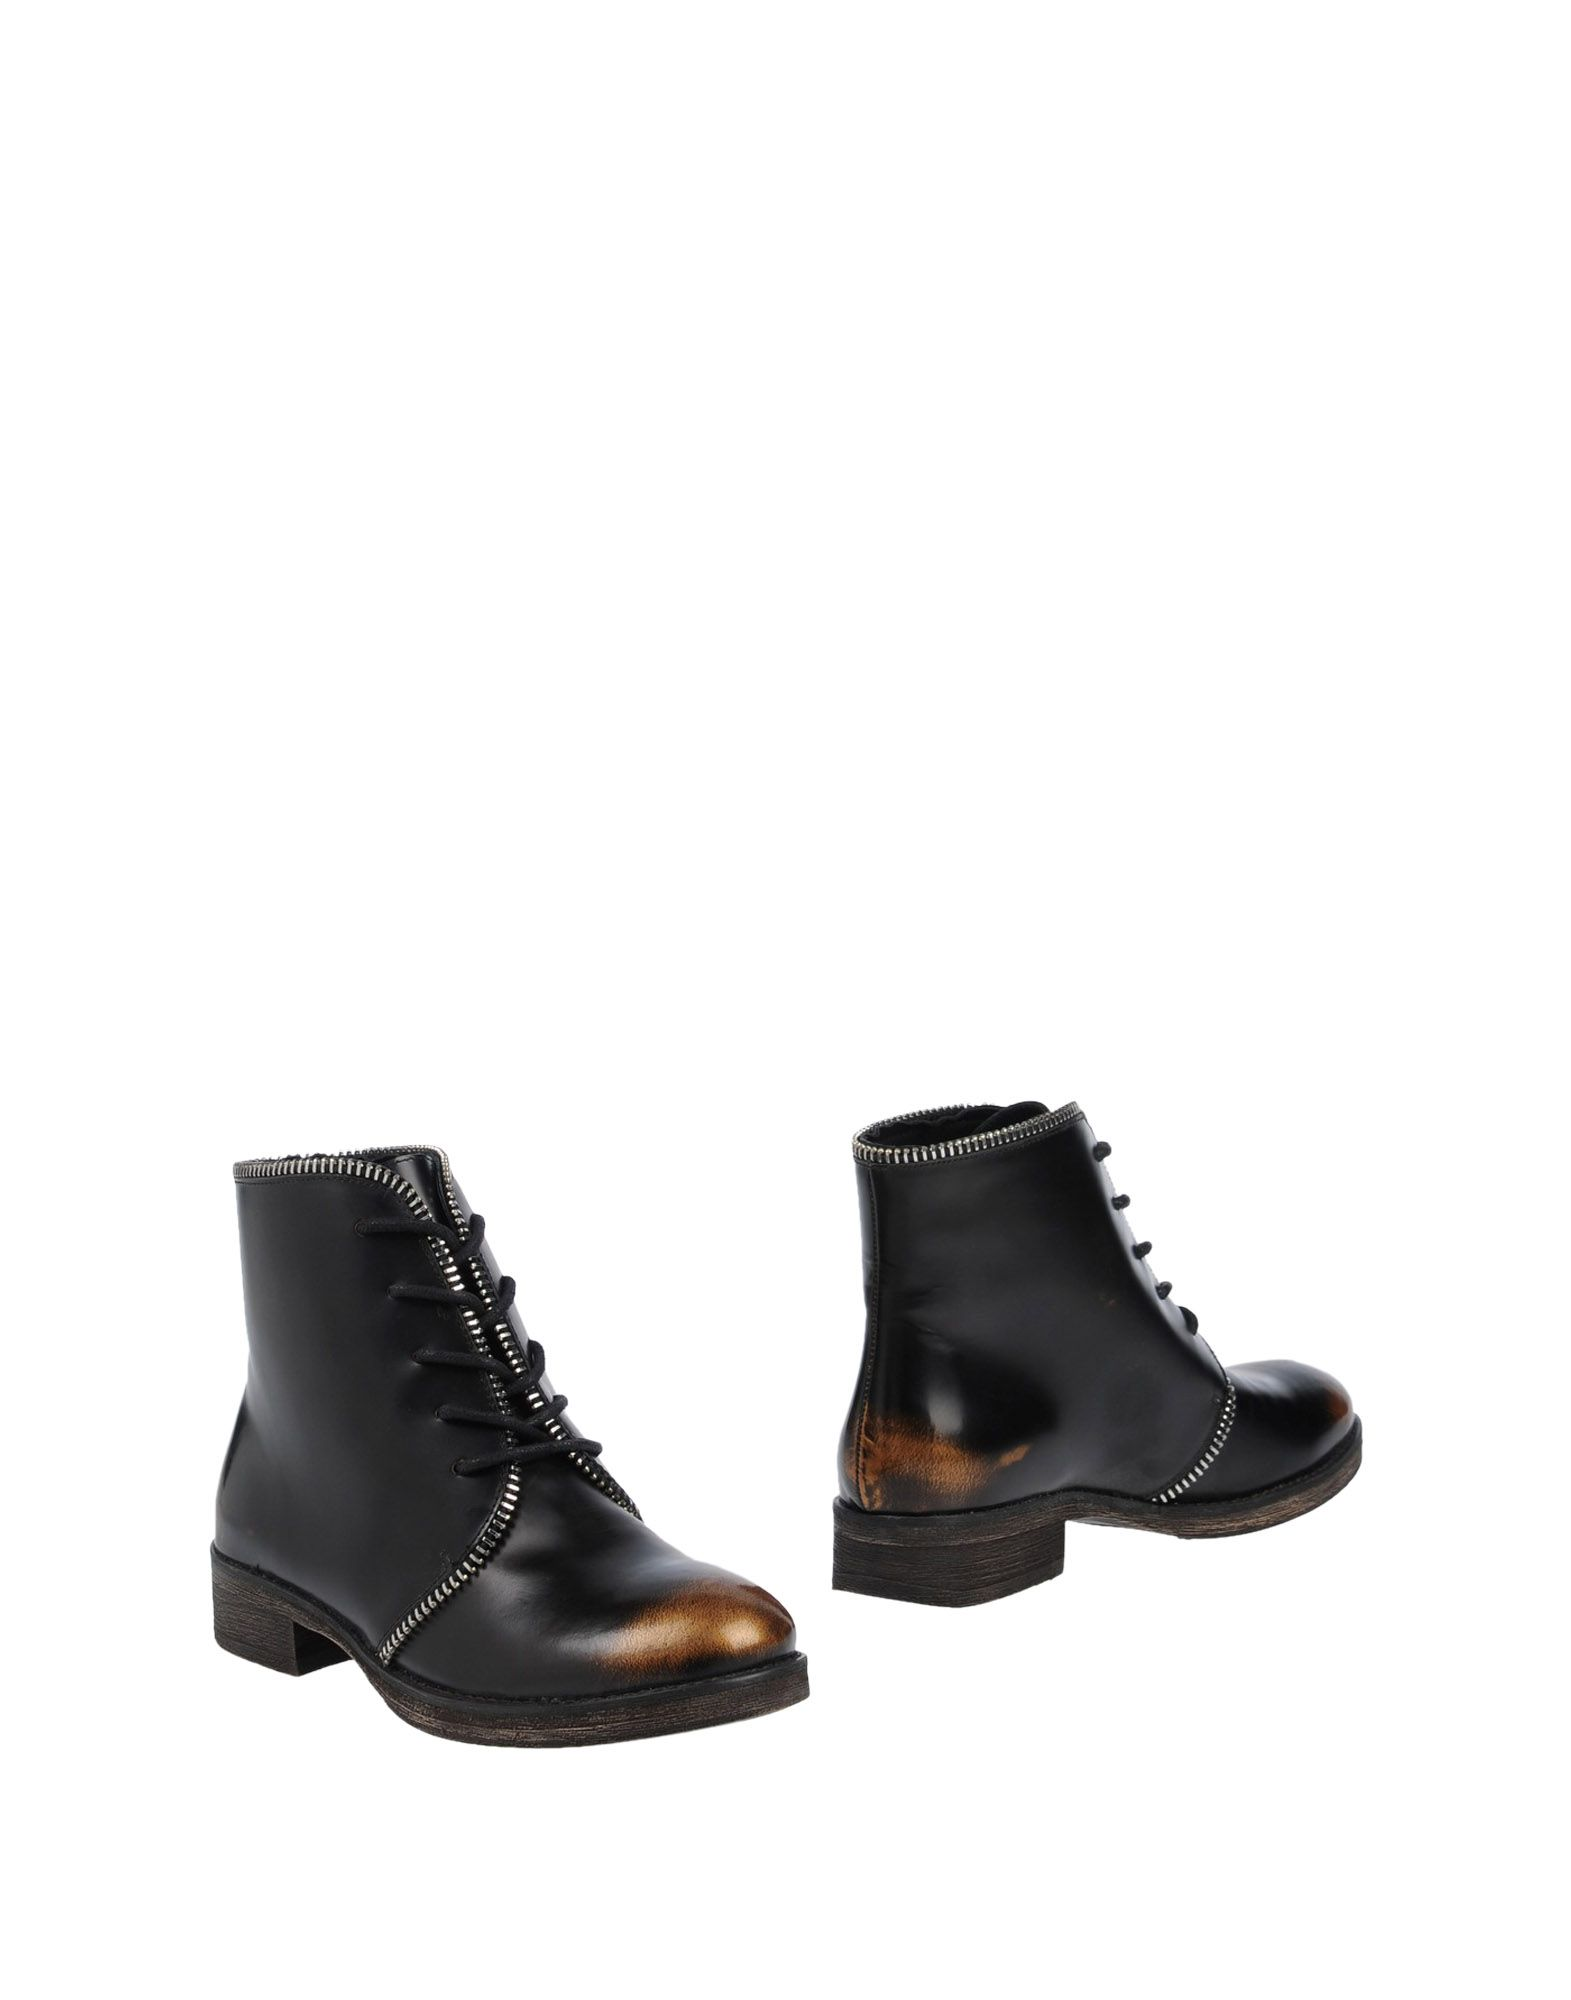 Gut um Stiefelette billige Schuhe zu tragenMi/Mai Stiefelette um Damen  11505749VW 9a1b2b